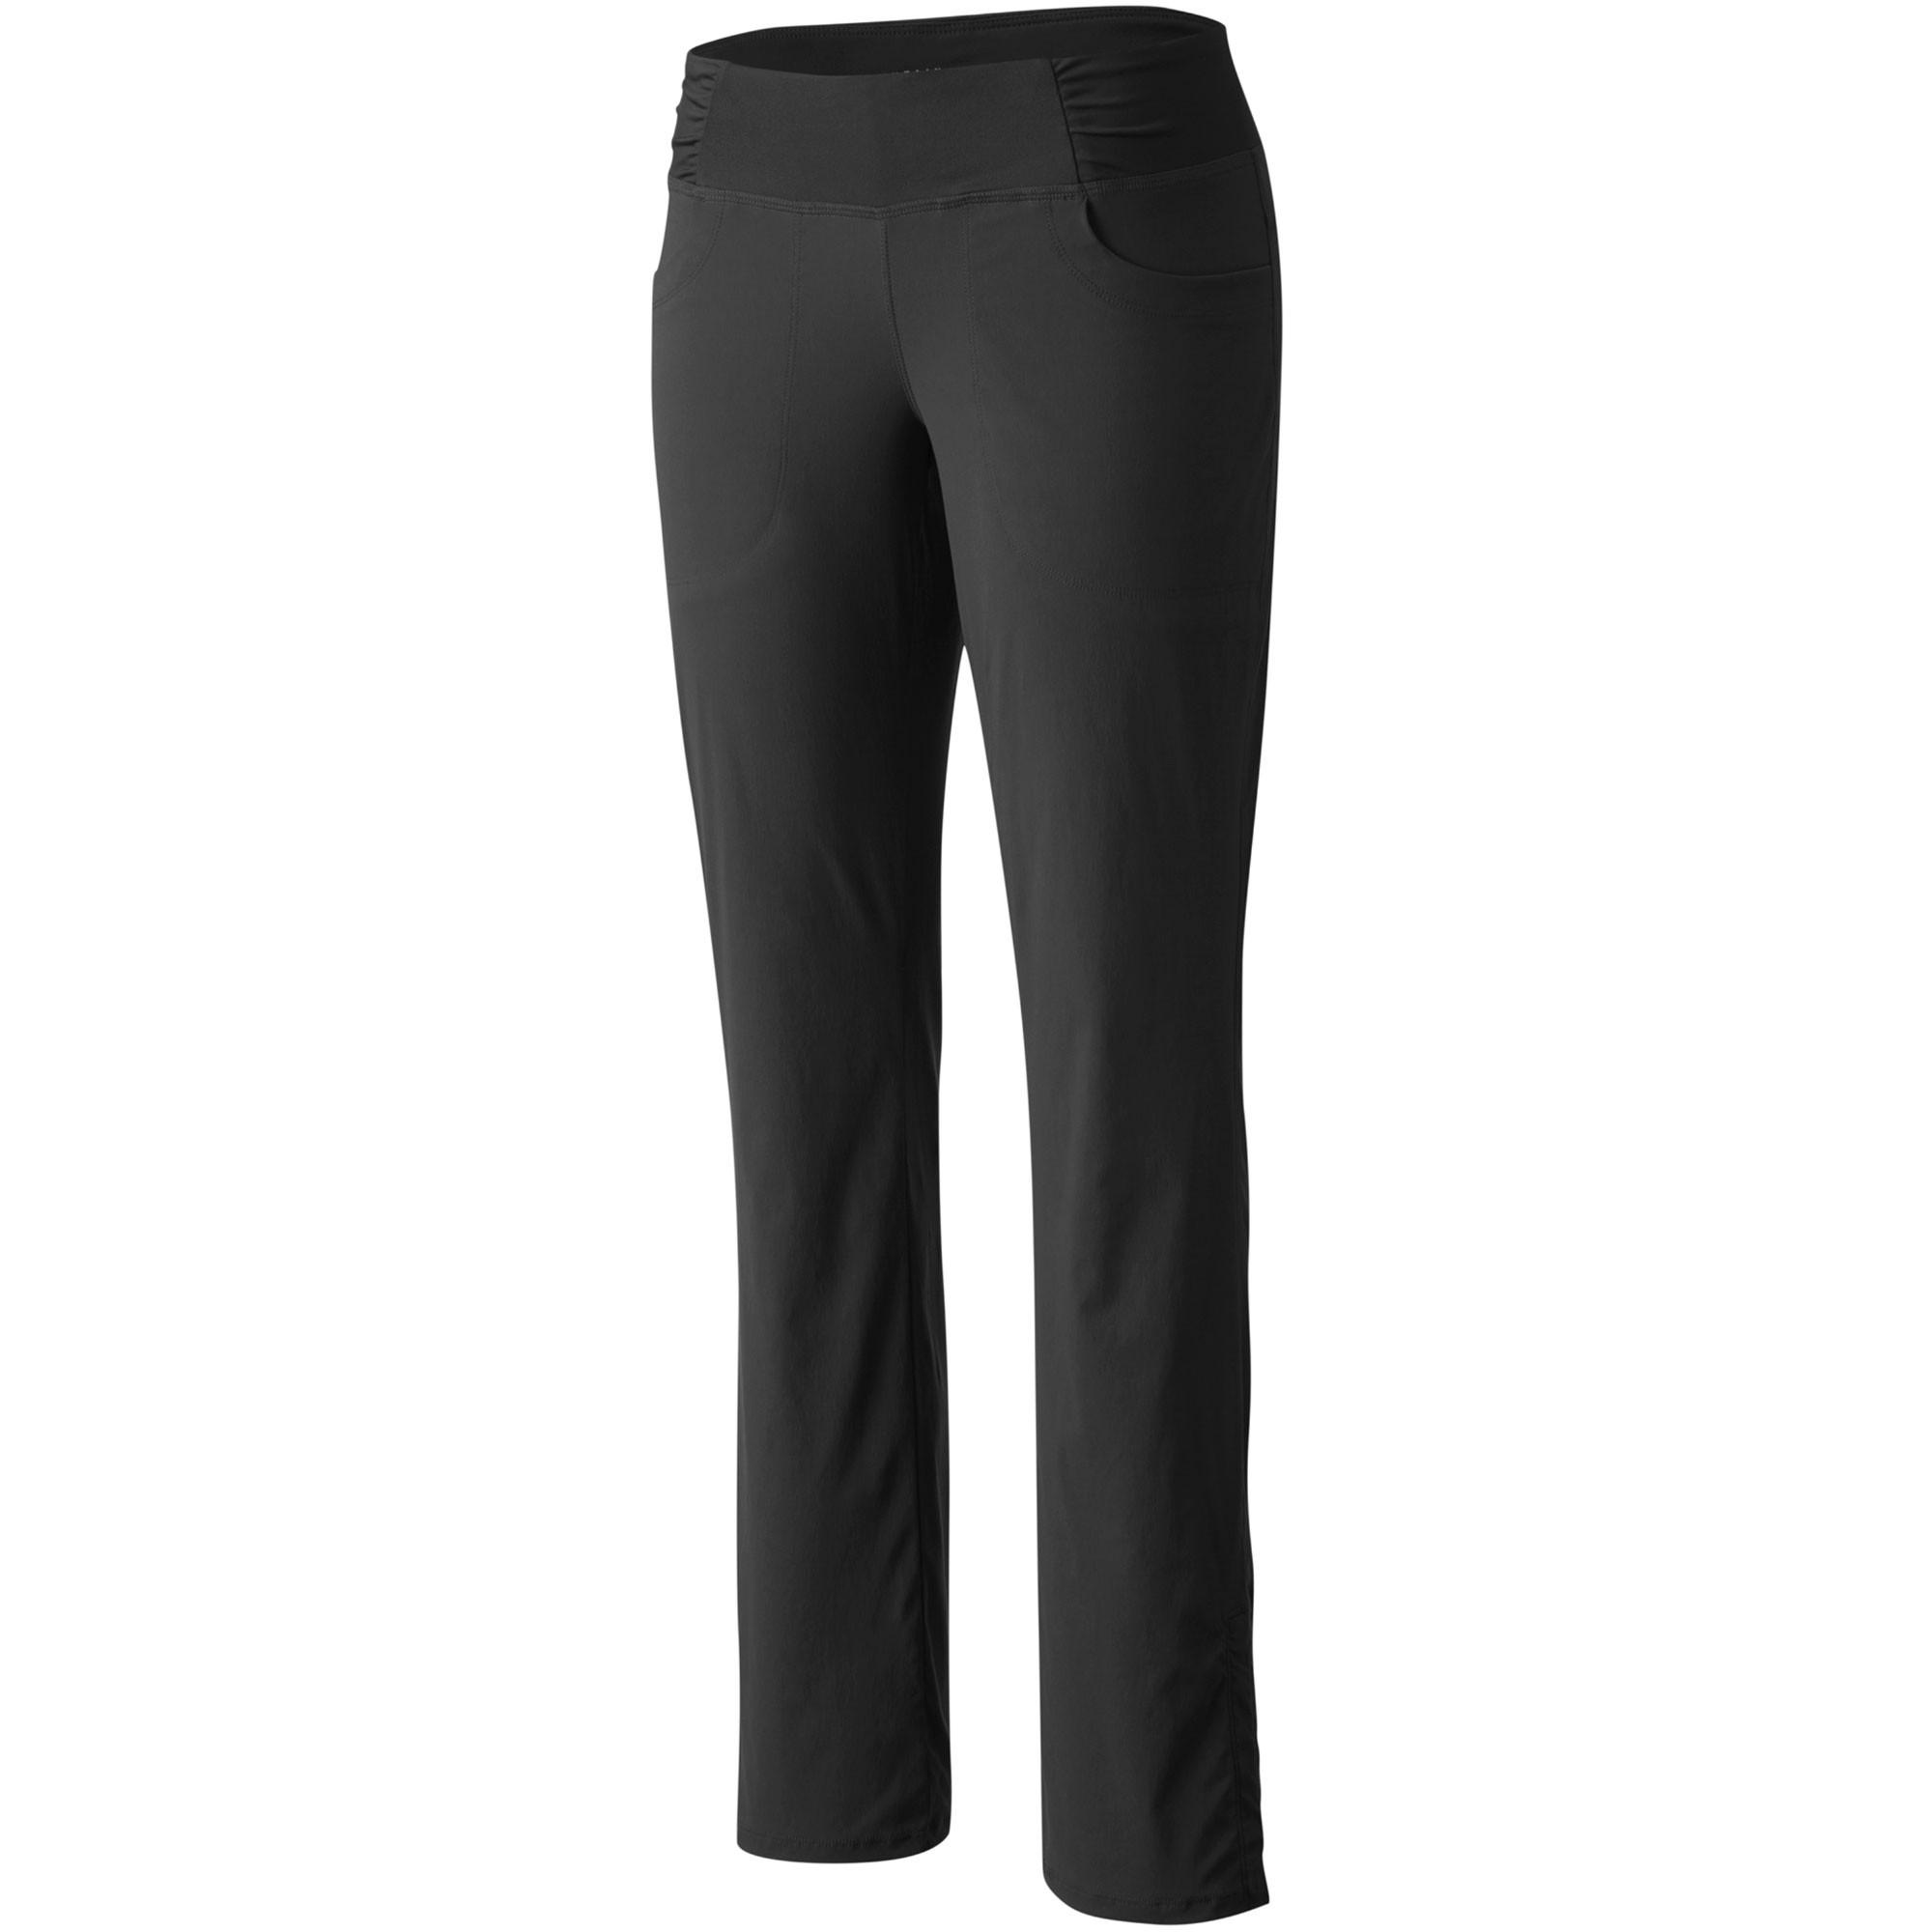 Mountain Hardwear Dynama Pants - Black - Front